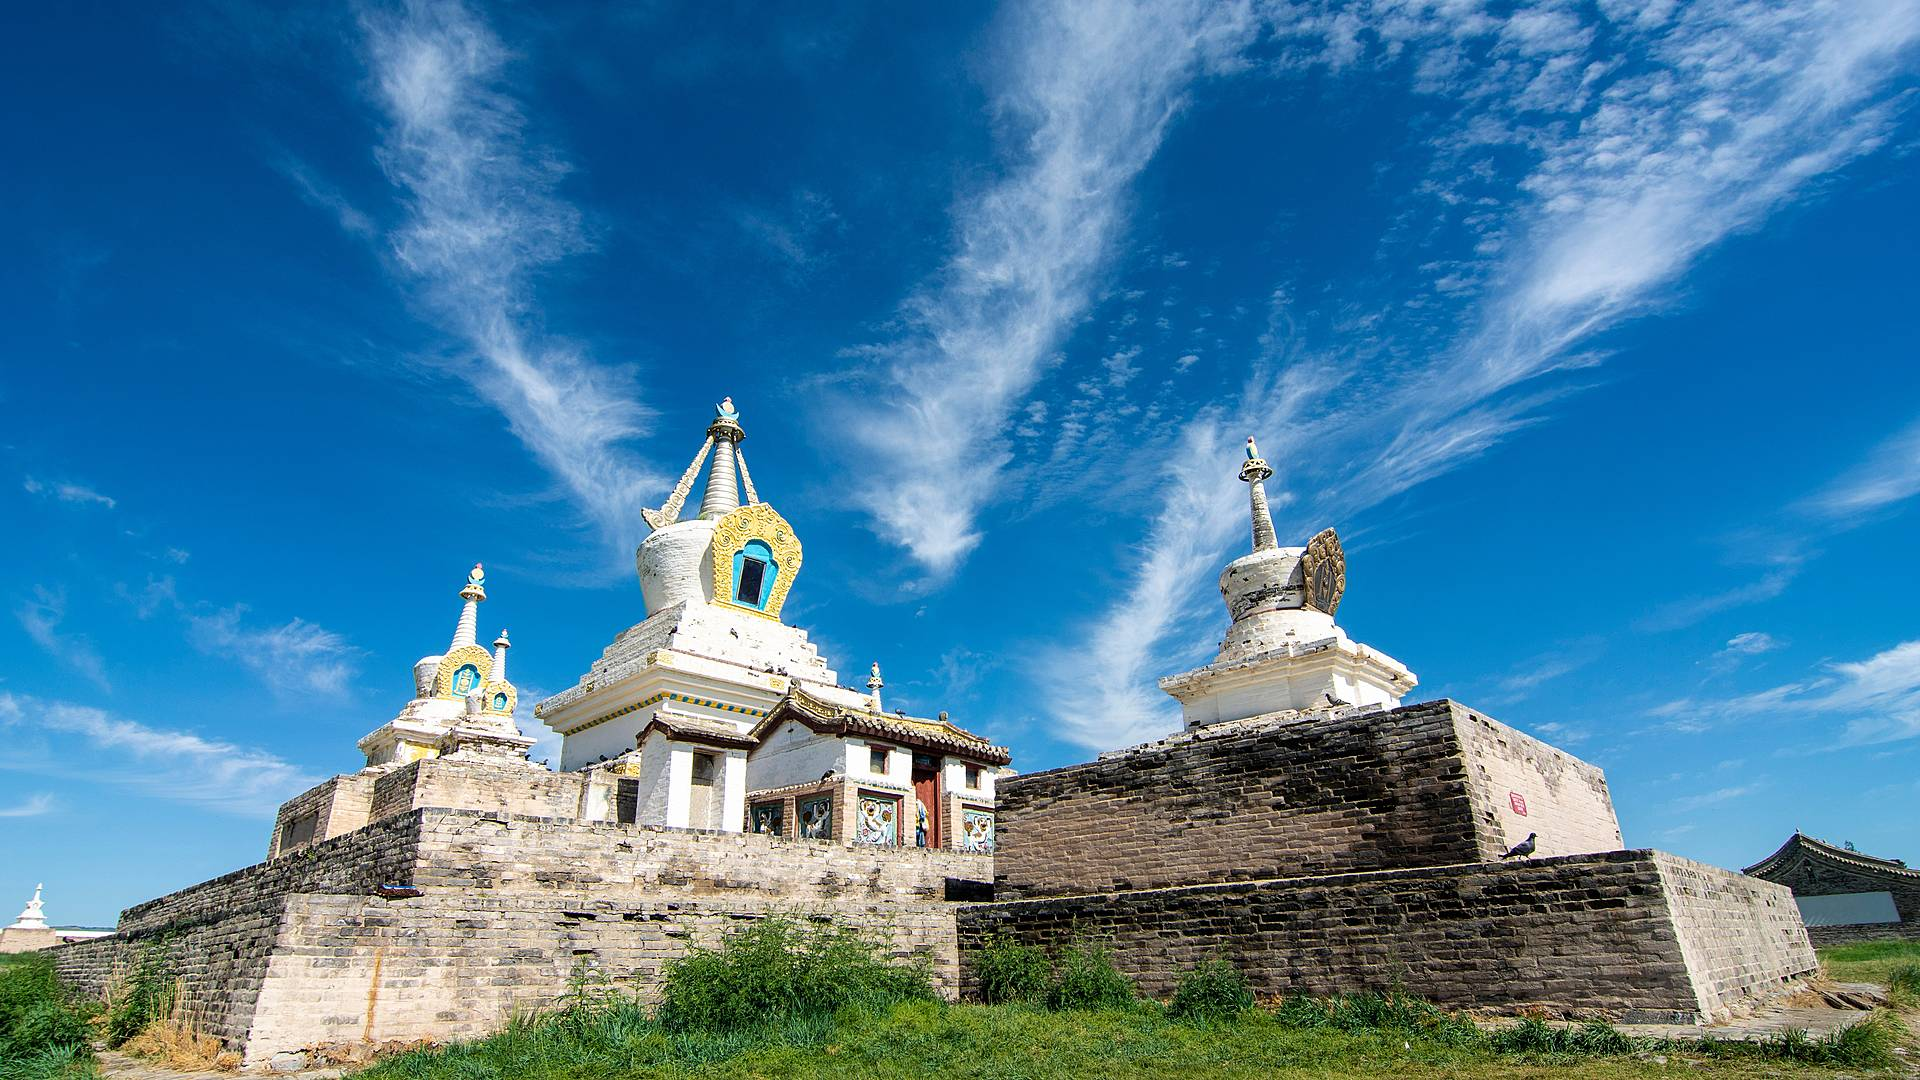 Del Valle de Orkhon al legendario Desierto de Gobi